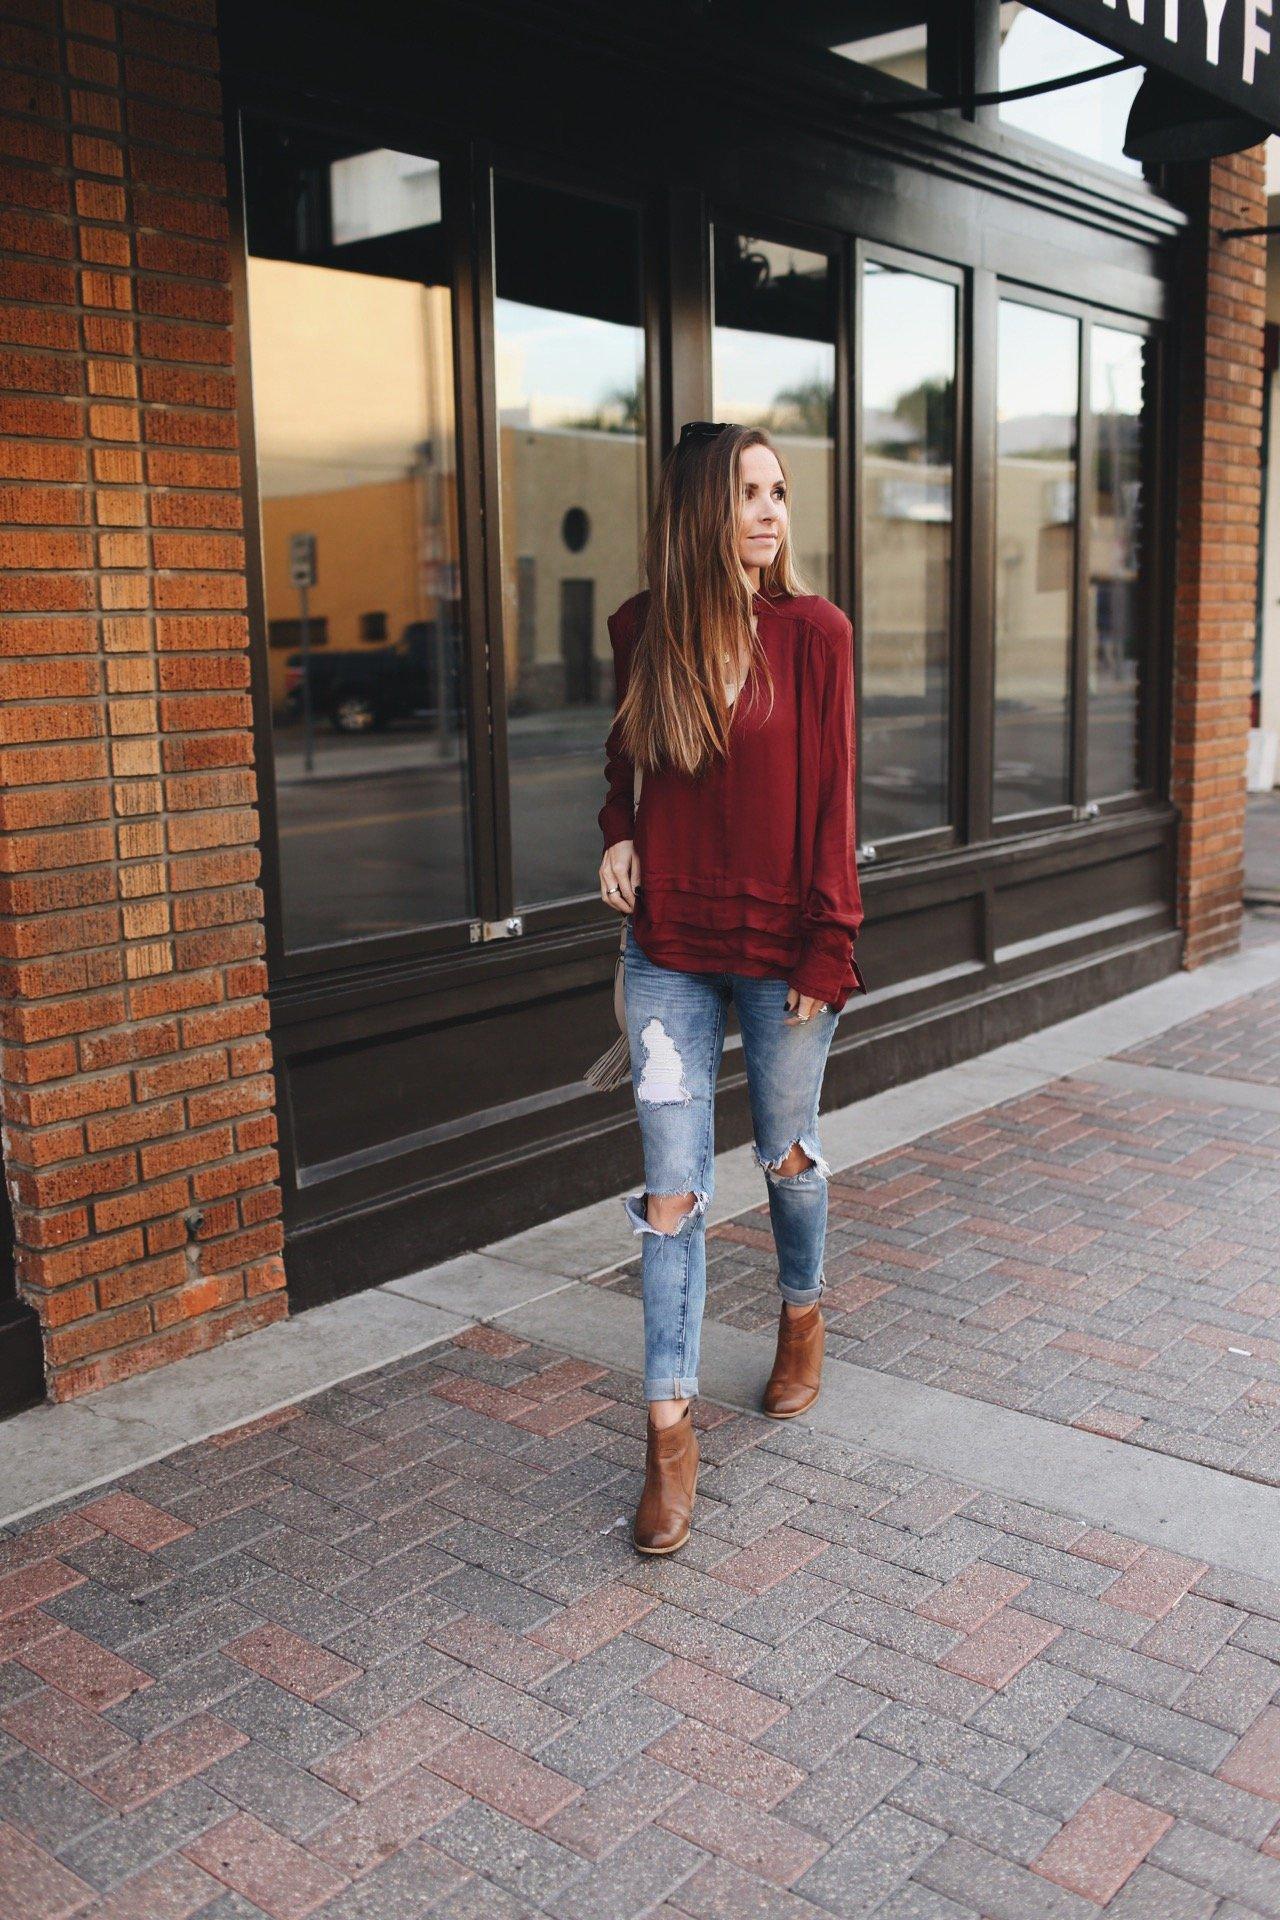 Merrick's Art Burgundy Top Boyfriend Jeans